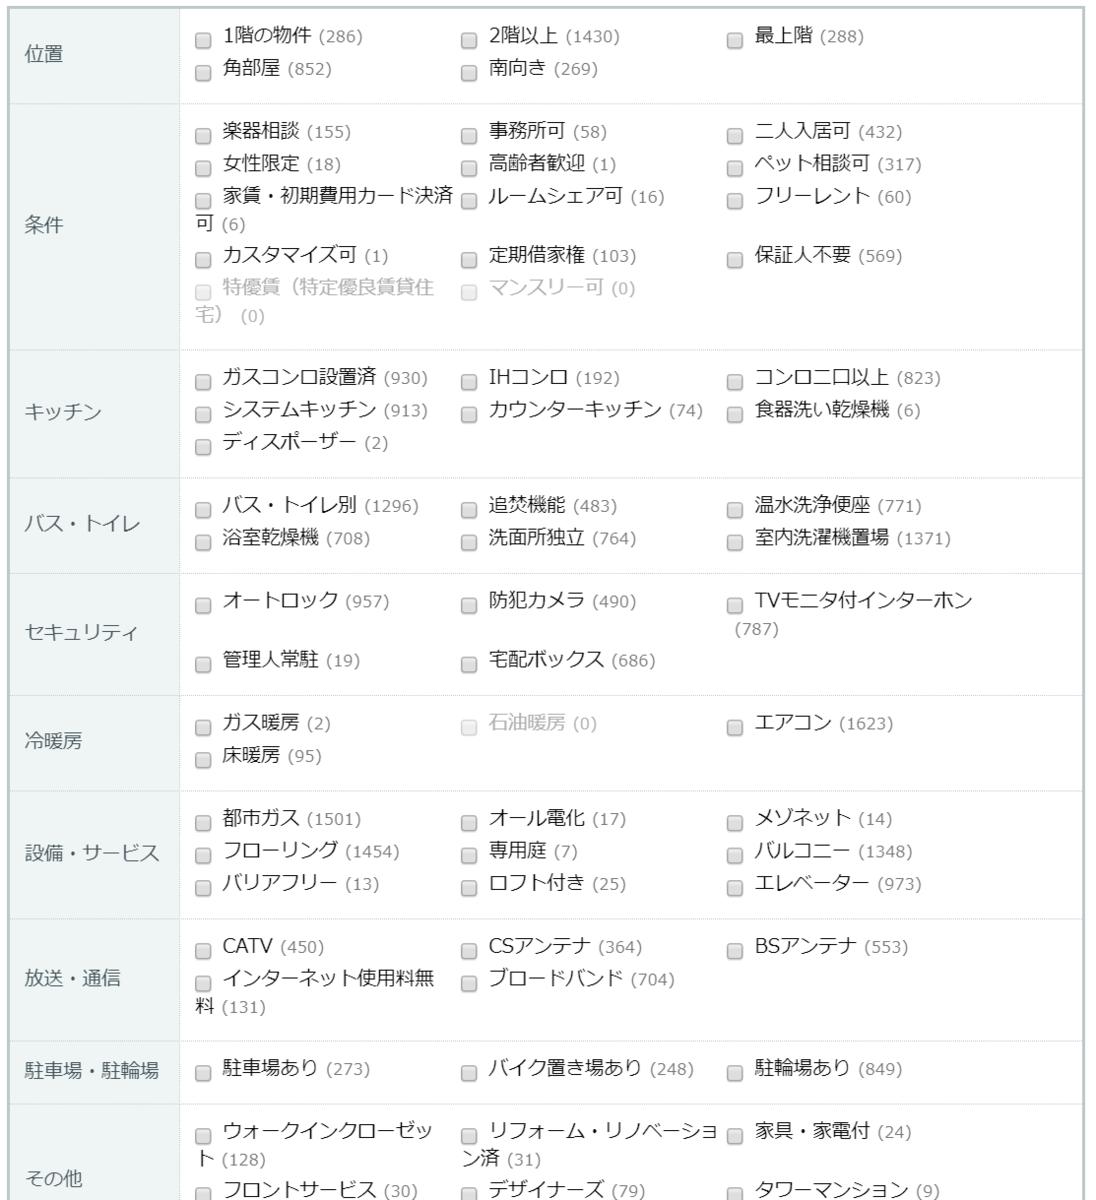 f:id:komekome61:20190321181822p:plain:w500